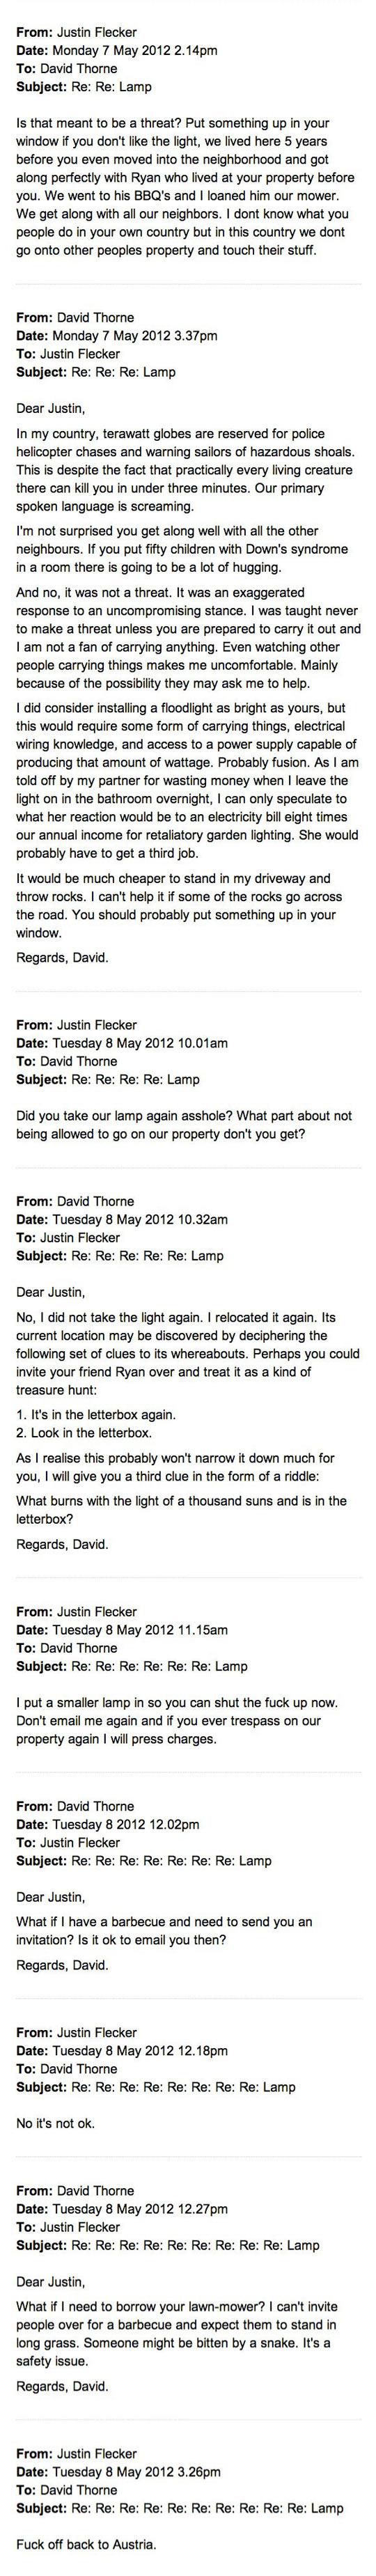 funny-Australian-troll-floodlight-neighbour-email